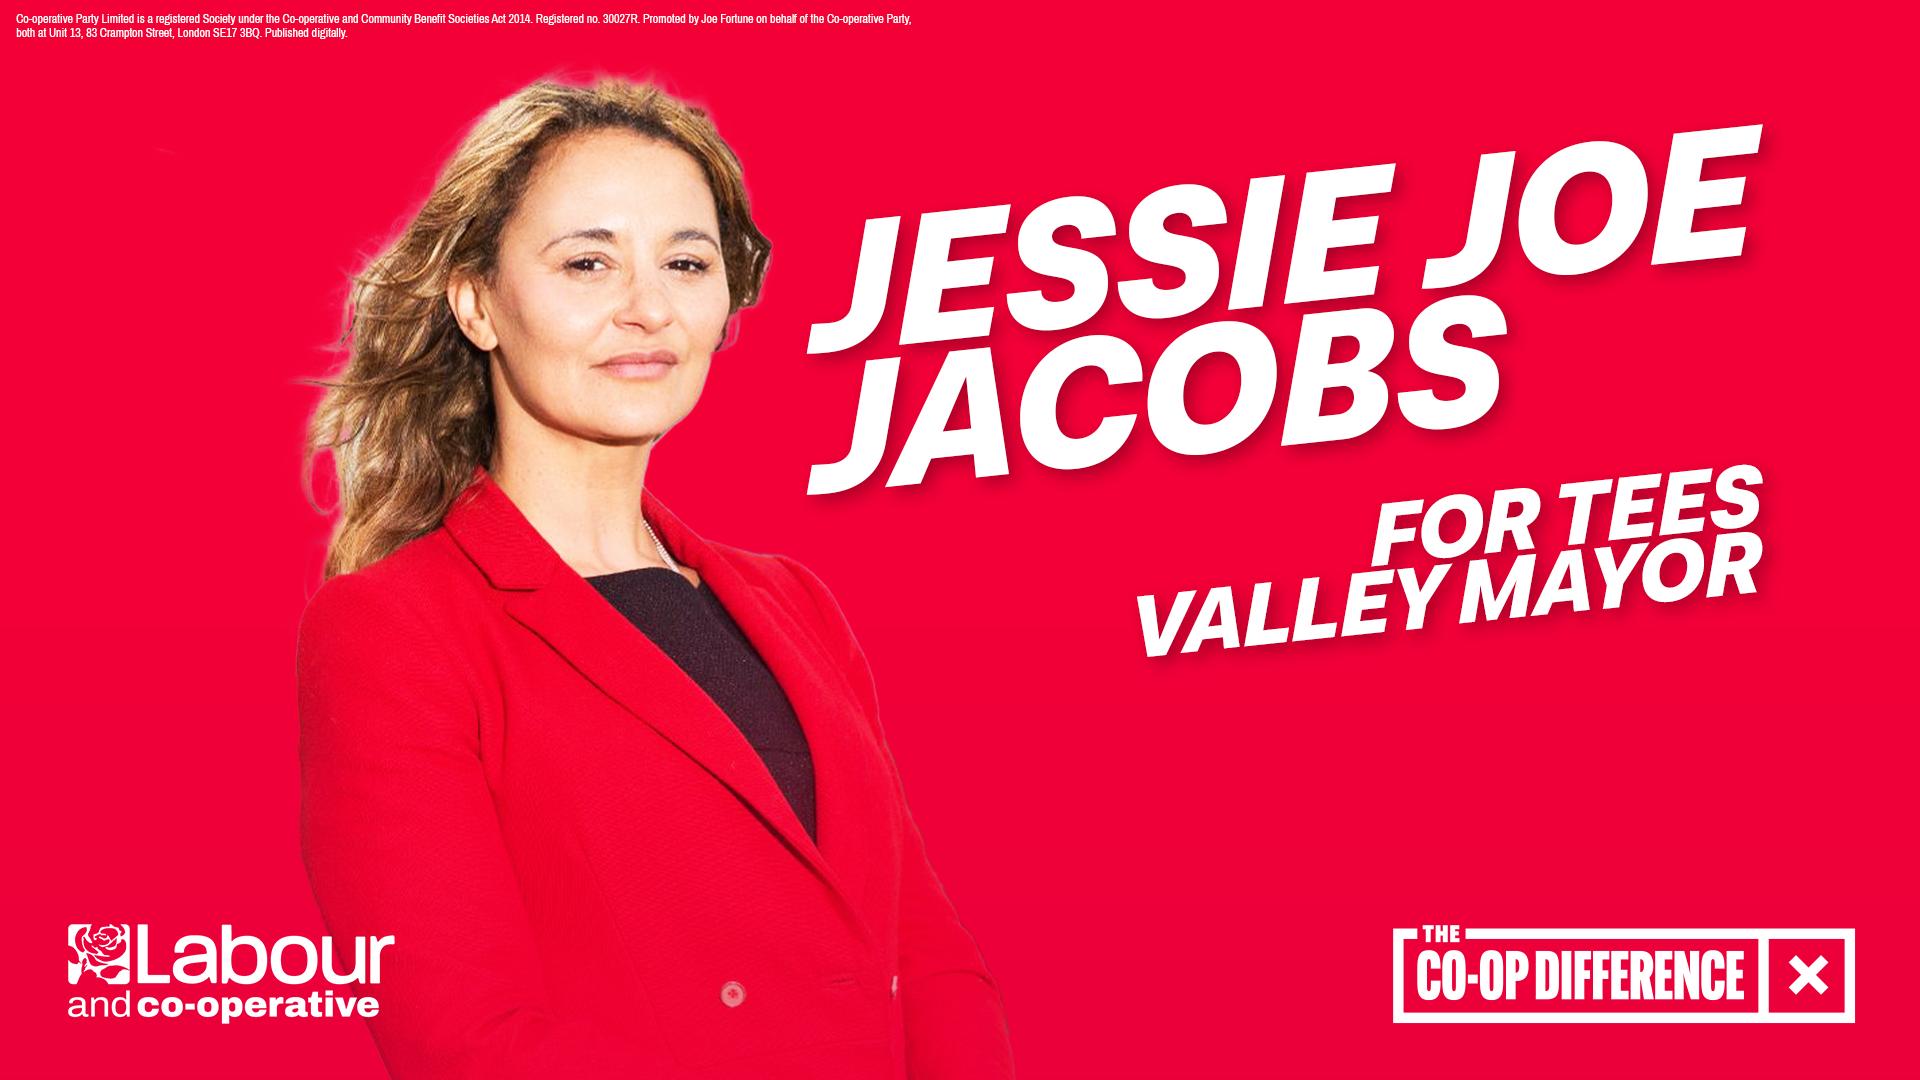 Jessie Joe Jacobs